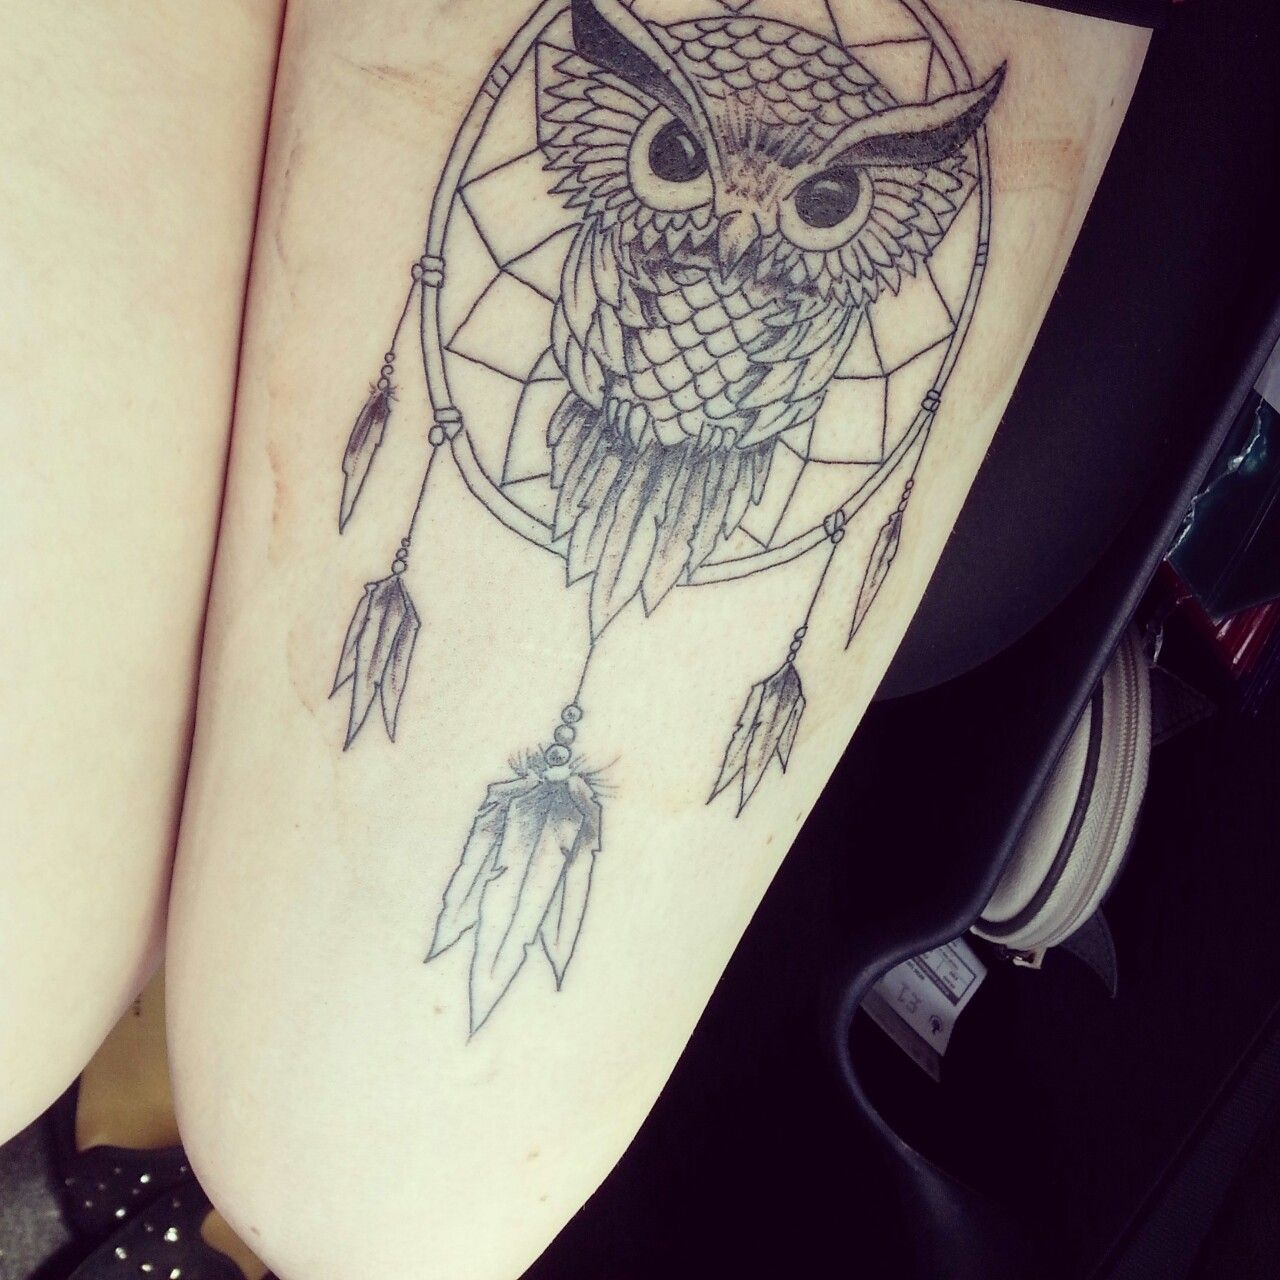 1001 id es de tatouage attrape r ve symbolique tattoo. Black Bedroom Furniture Sets. Home Design Ideas